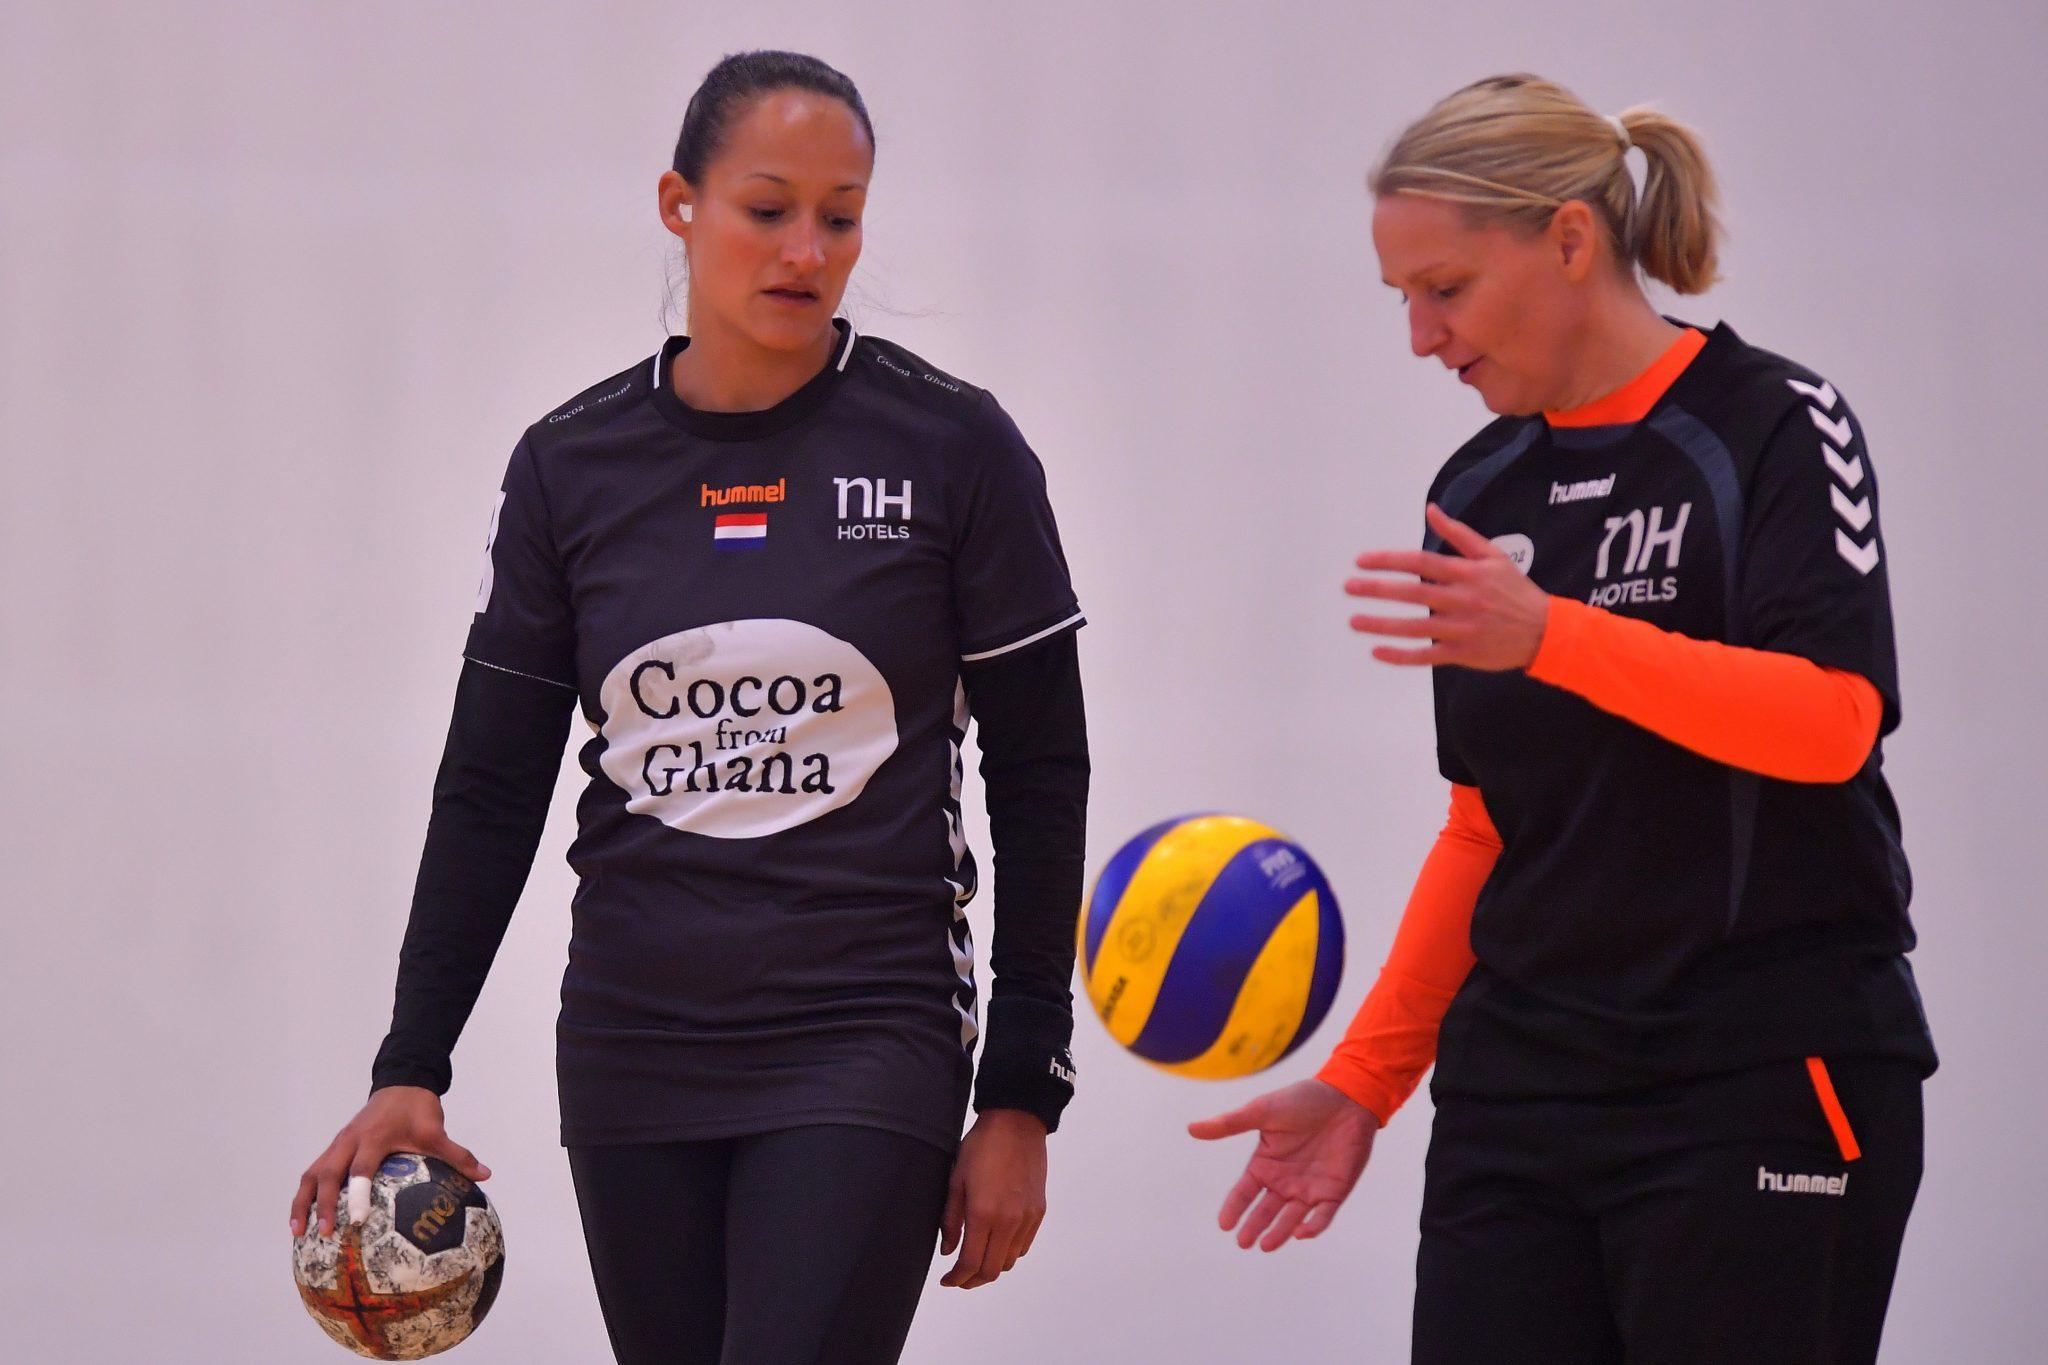 10-12-2017 HANDBAL:PERSMOMENT:MAGDEBURG Training Nederland Dames Handbalteam Pearl Van Der Wissel  Met Helle Thomsen  Foto: Henk Seppen